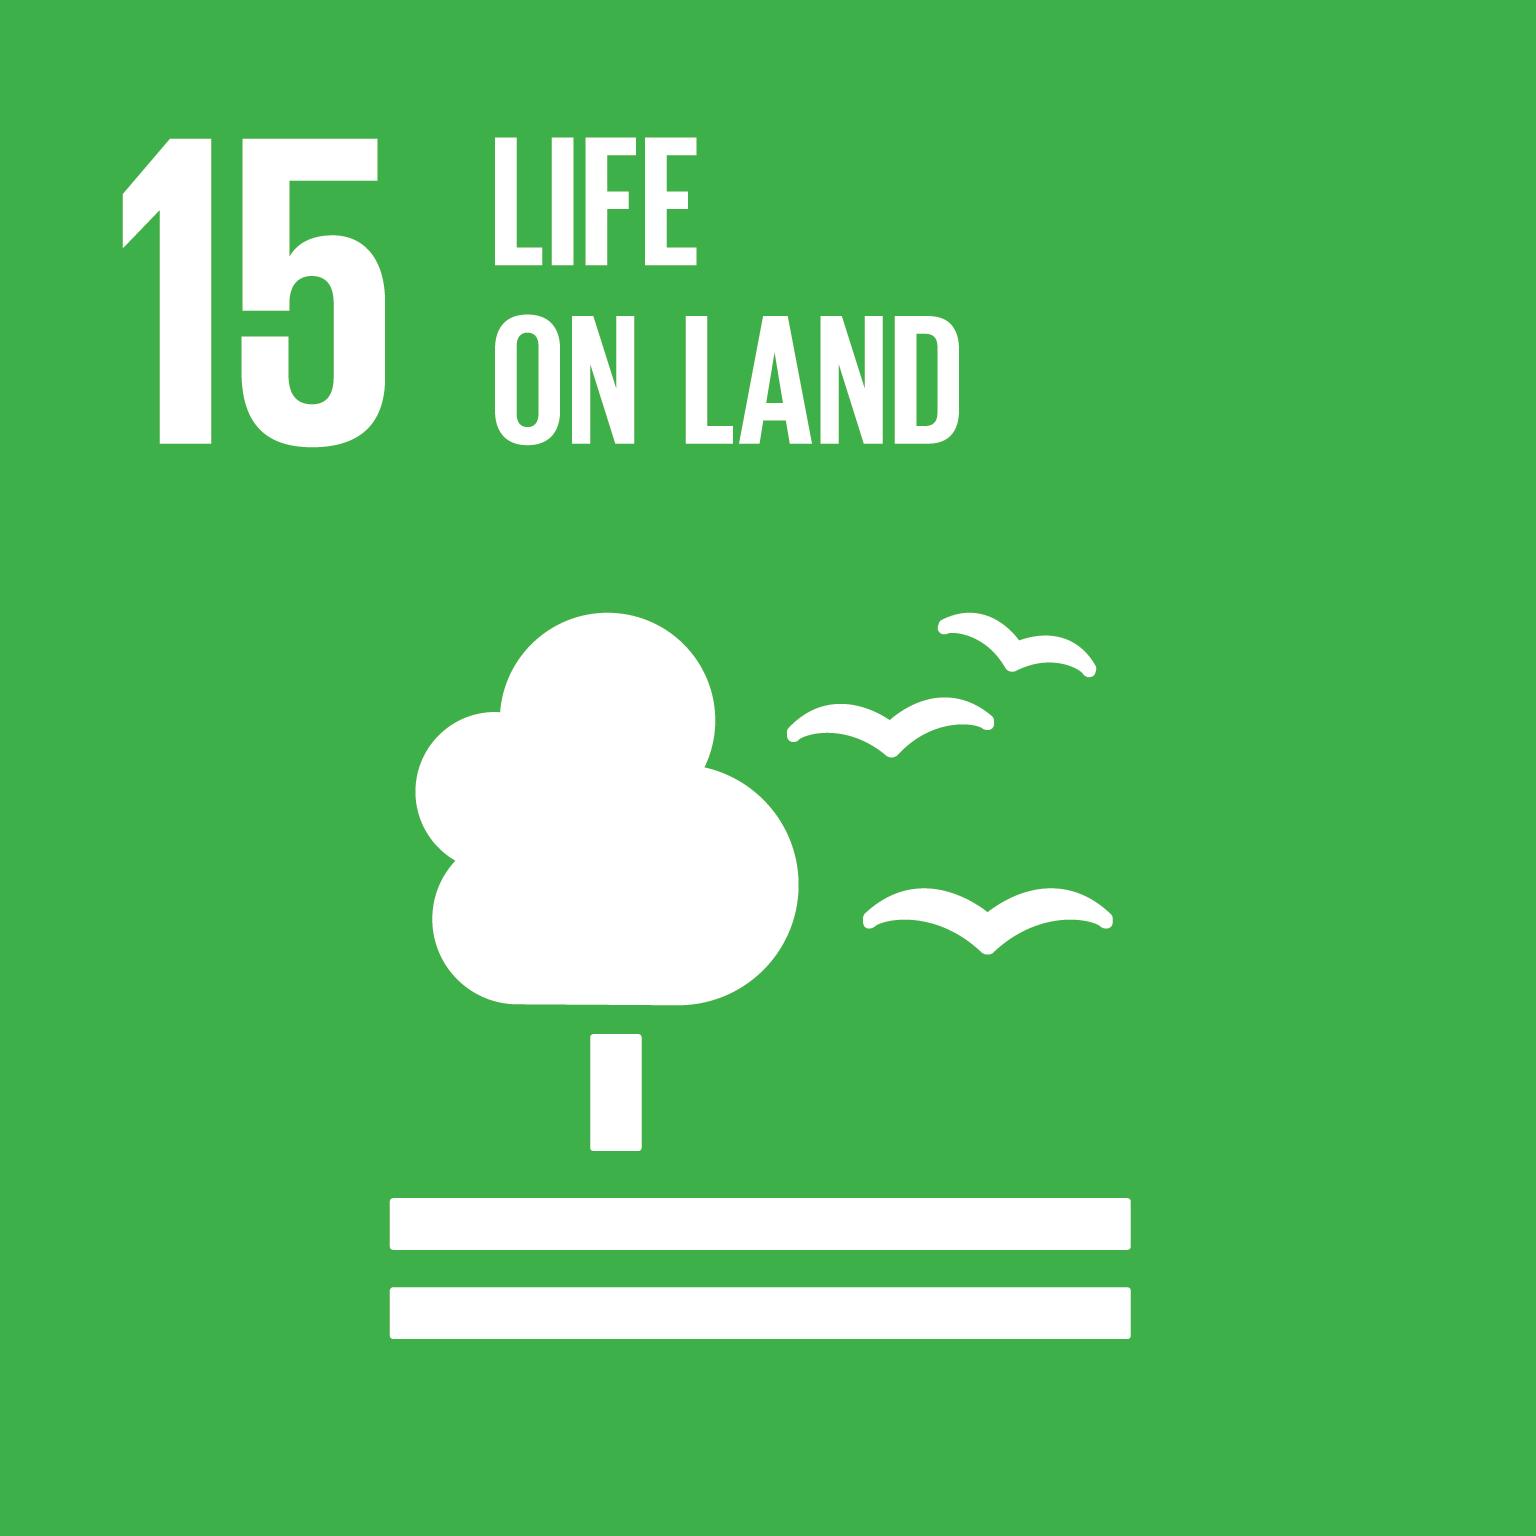 Life on land (15)